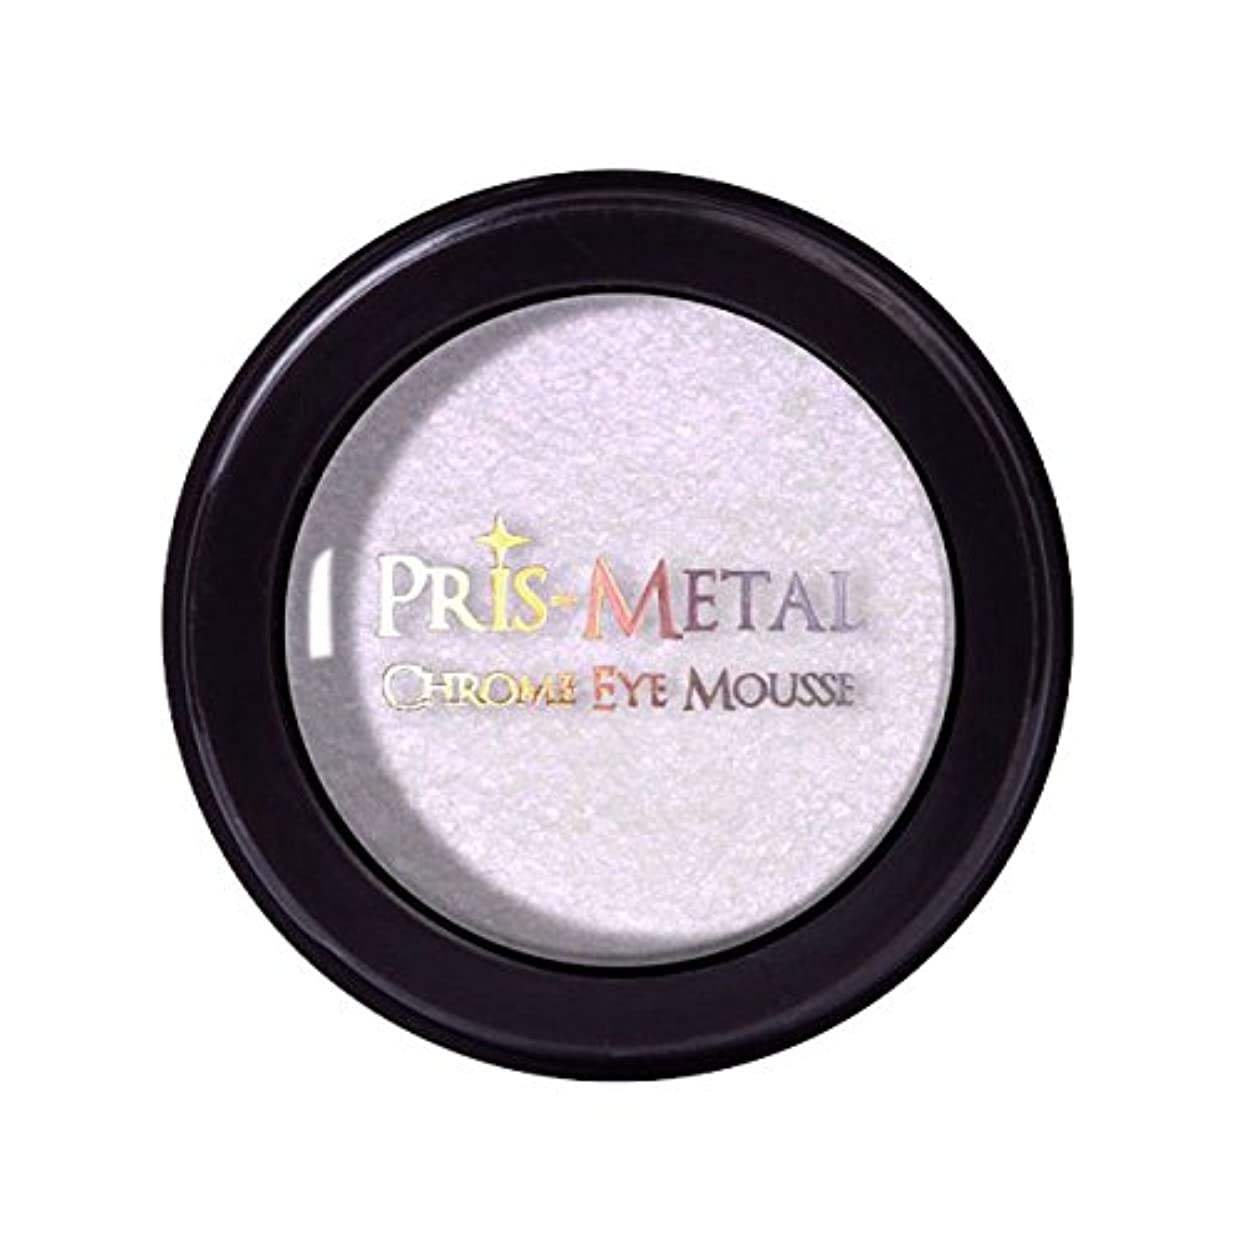 記憶論文ボリューム(3 Pack) J. CAT BEAUTY Pris-Metal Chrome Eye Mousse - Pinky Promise (並行輸入品)